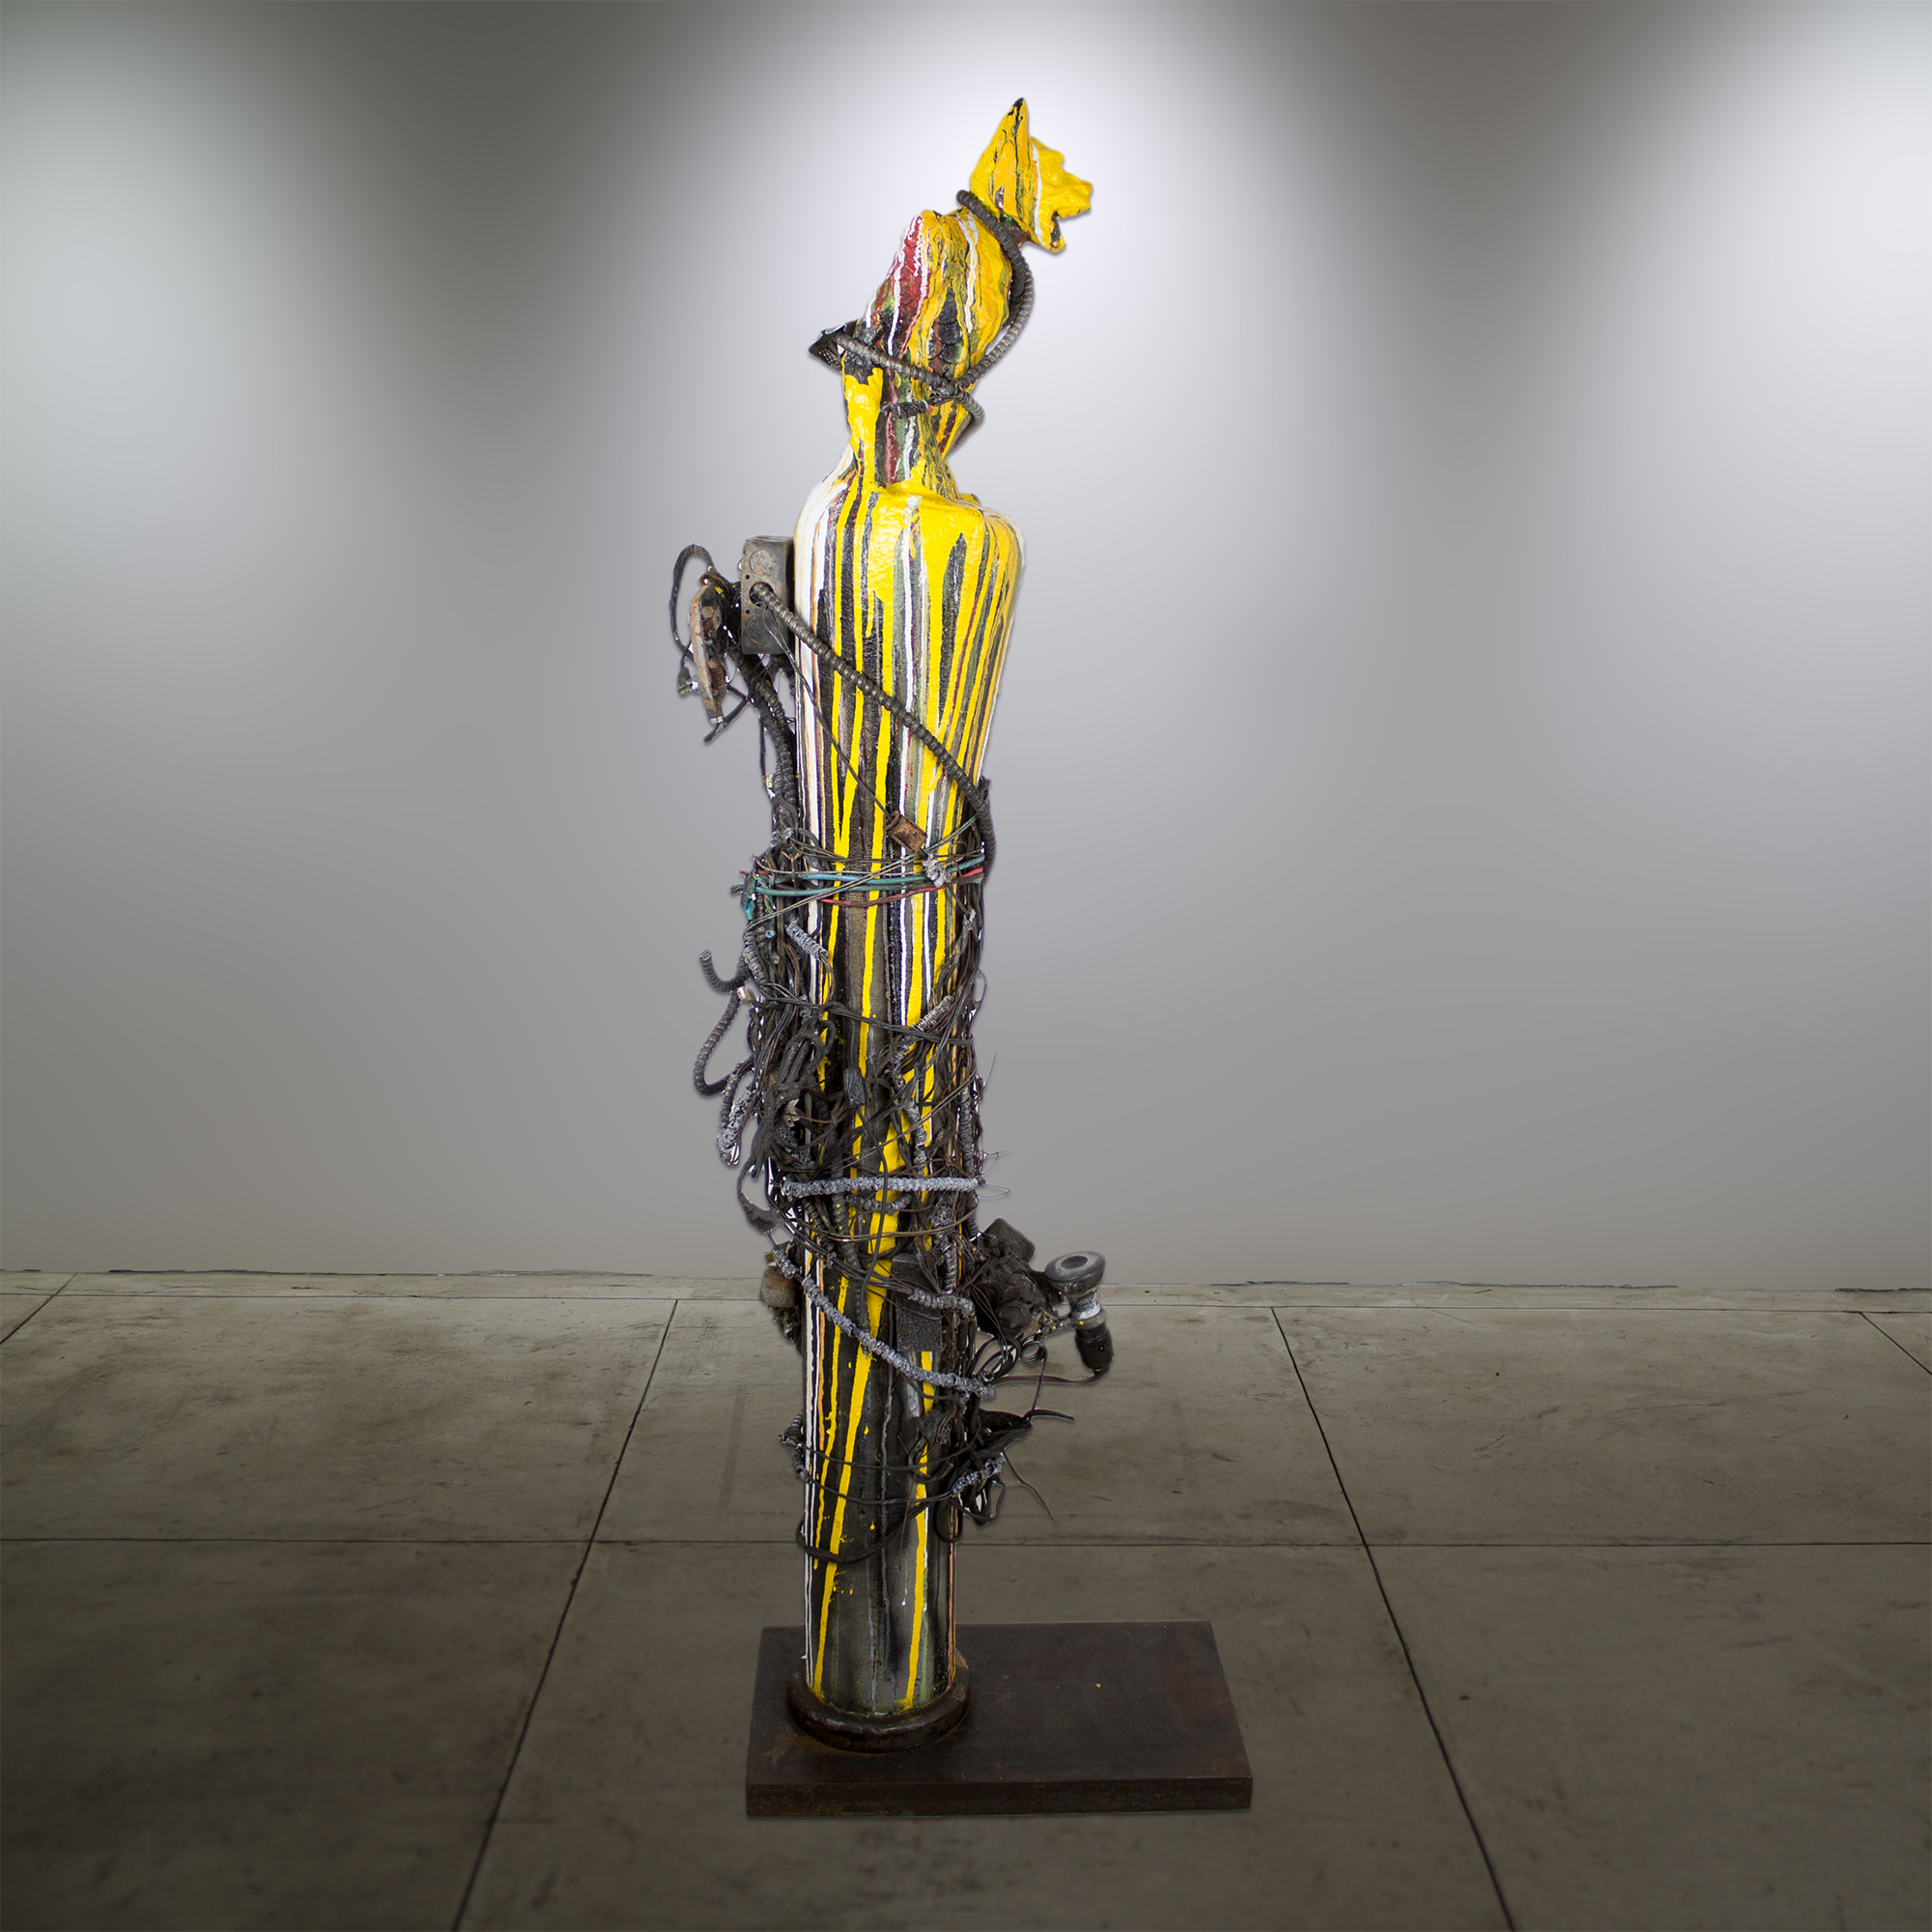 """Gargoyle rising from the ashes"" - Sculpture, Metal base, Concrete, Gargoyle - 20""x11""x63"" - © Flavio Bisciotti"